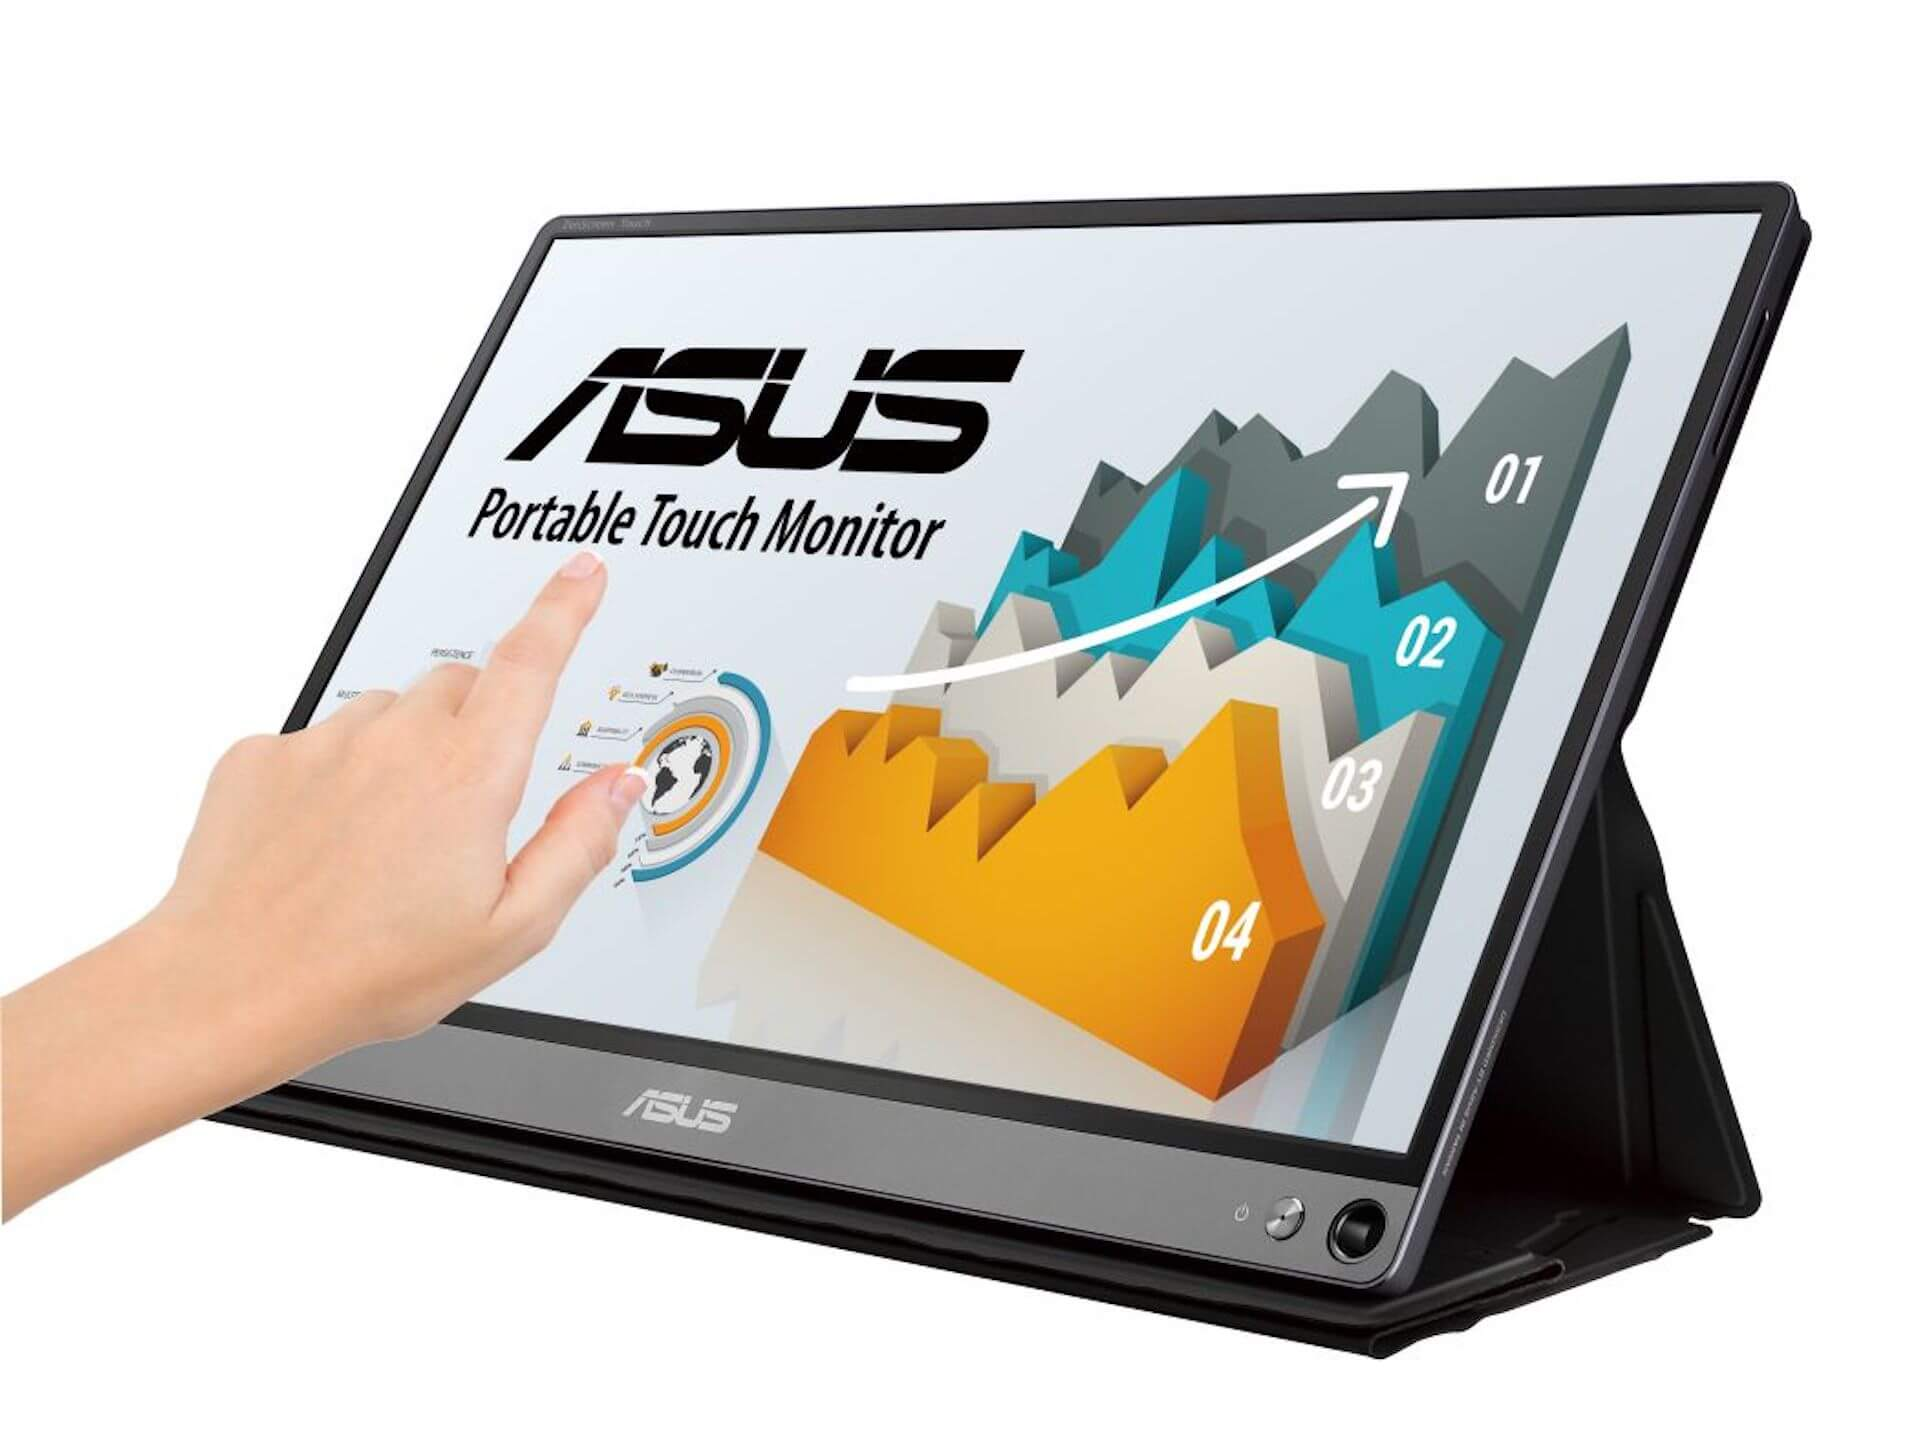 USB-C&micro HDMI端子搭載!わずか9mmの超薄型ディスプレイ2製品がASUSから登場 tech190918_asus_display_4